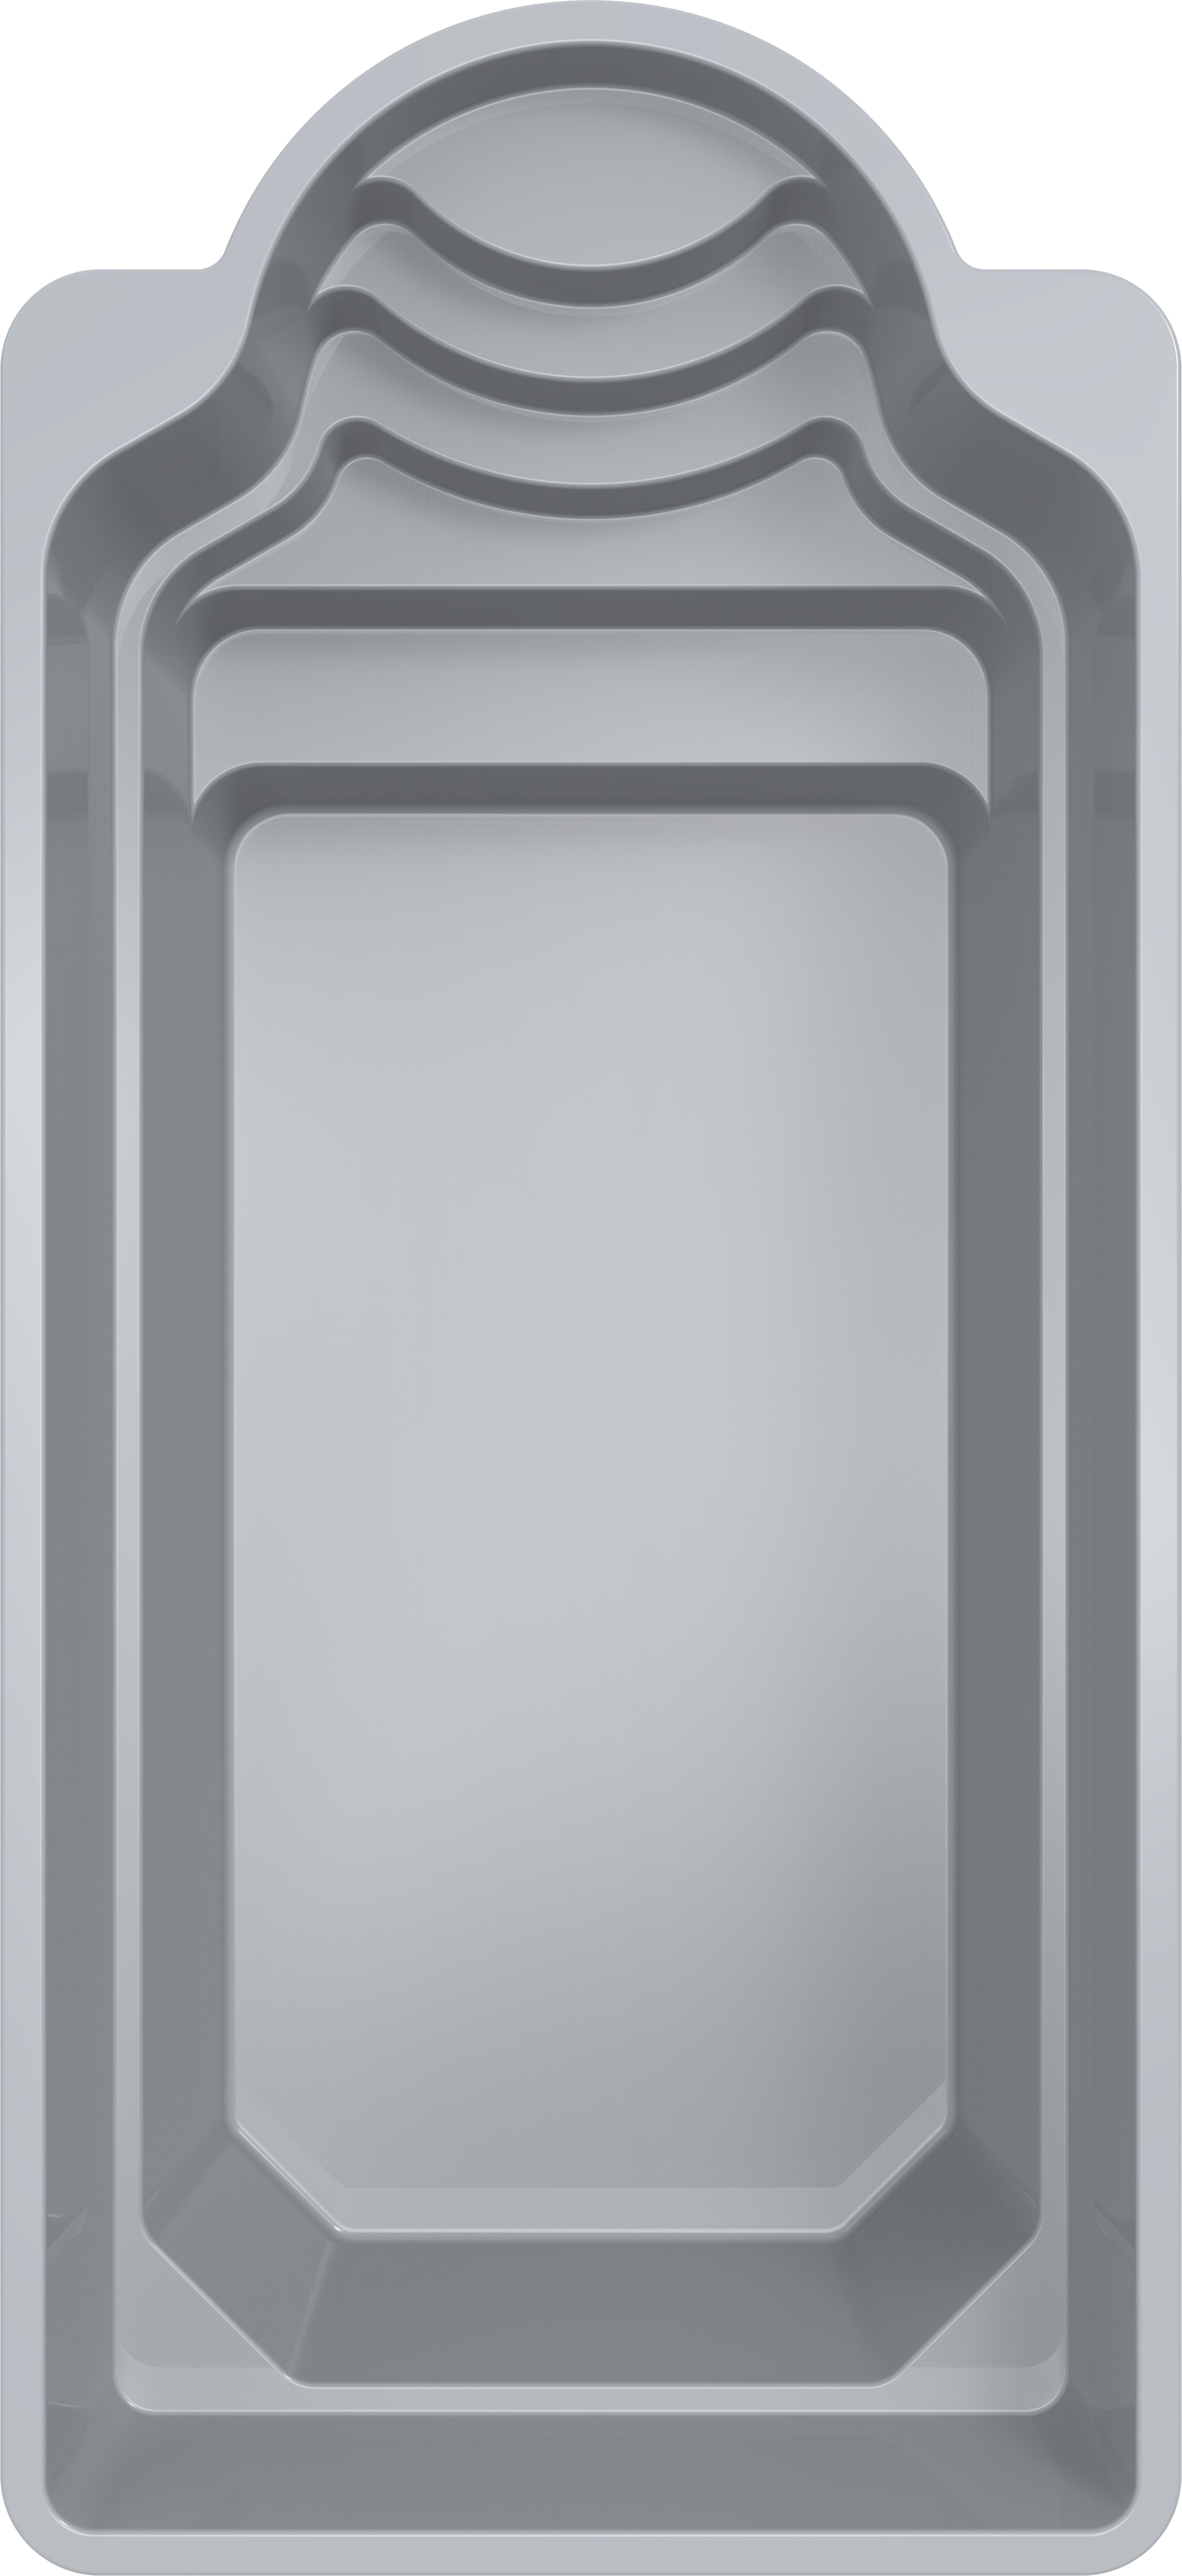 Stiklo pluosto baseinas Halo 8